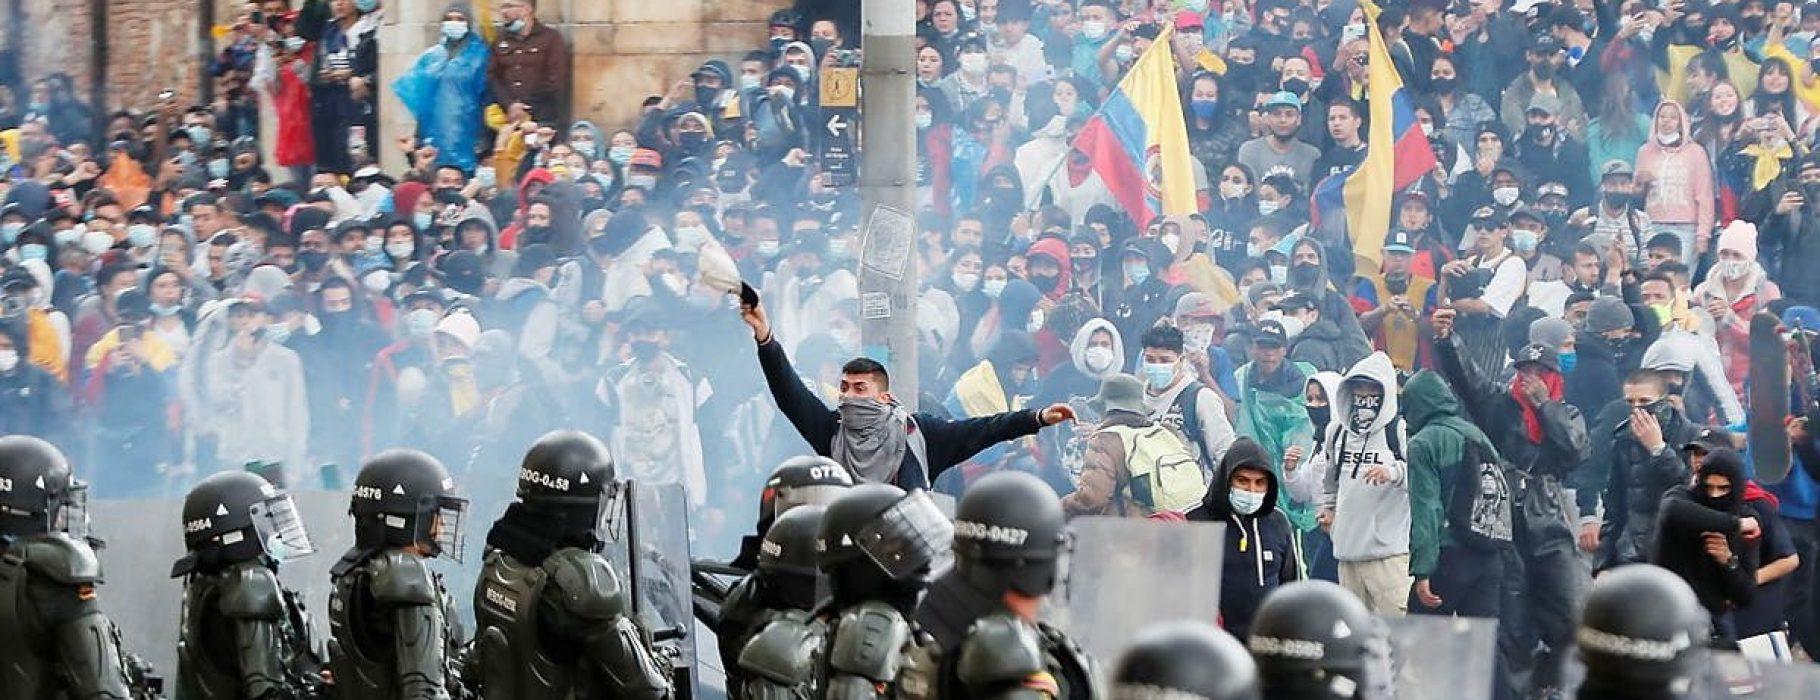 Colombian protesters advance through tear gas towards a police lline